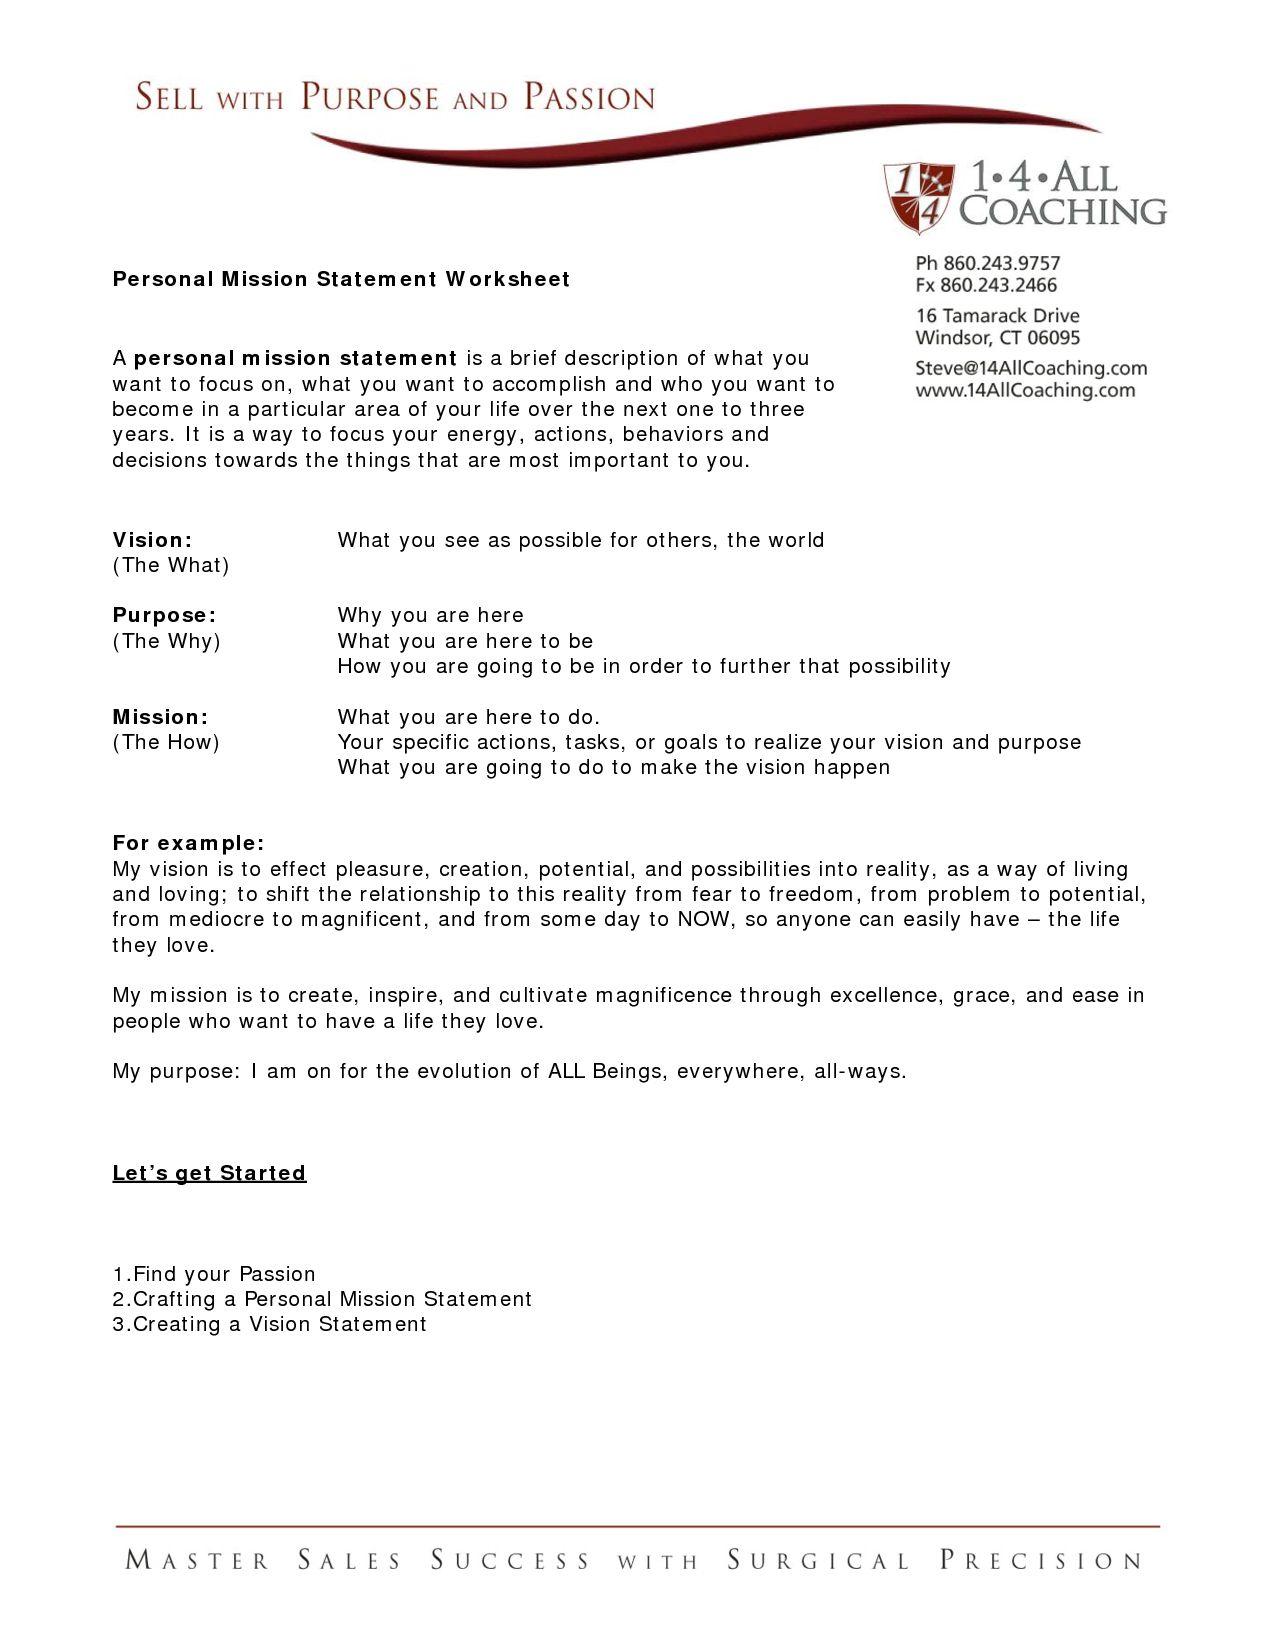 Family Mission Statement Worksheet  Briefencounters And Family Mission Statement Worksheet